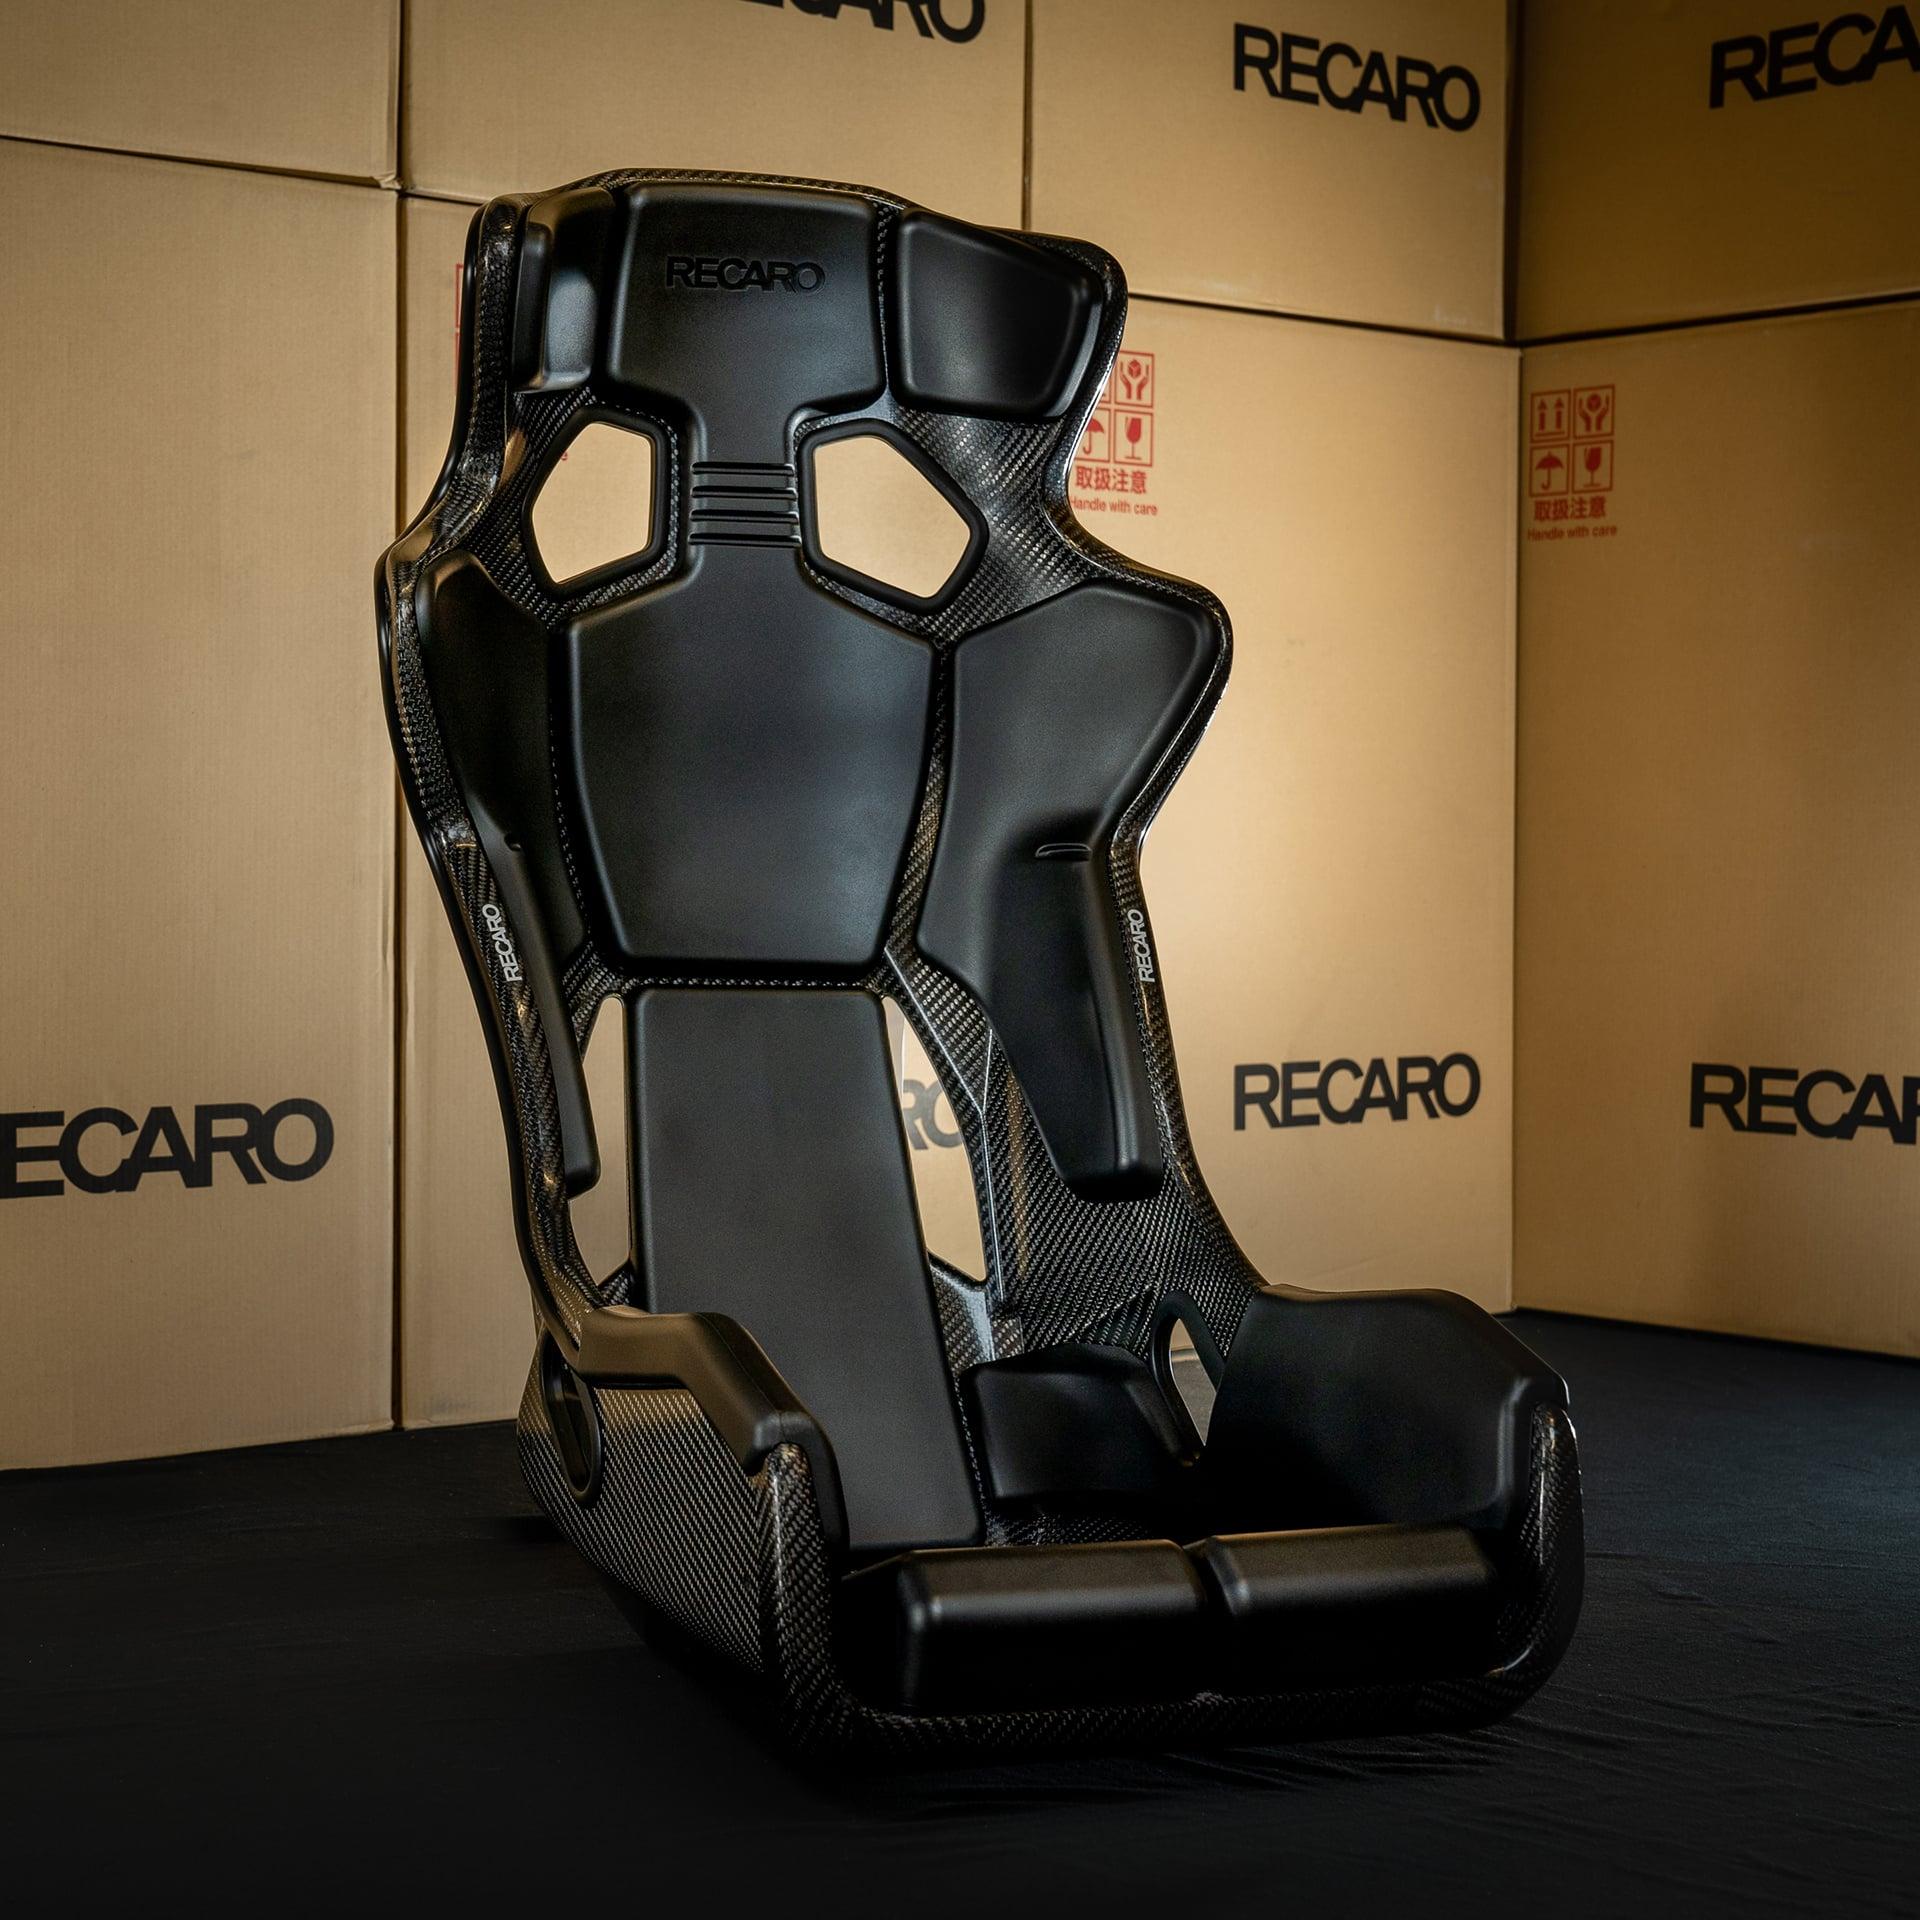 Recaro Pro Racer Rms 2600a Carbon Fiber Bucket Seat Buildjournal